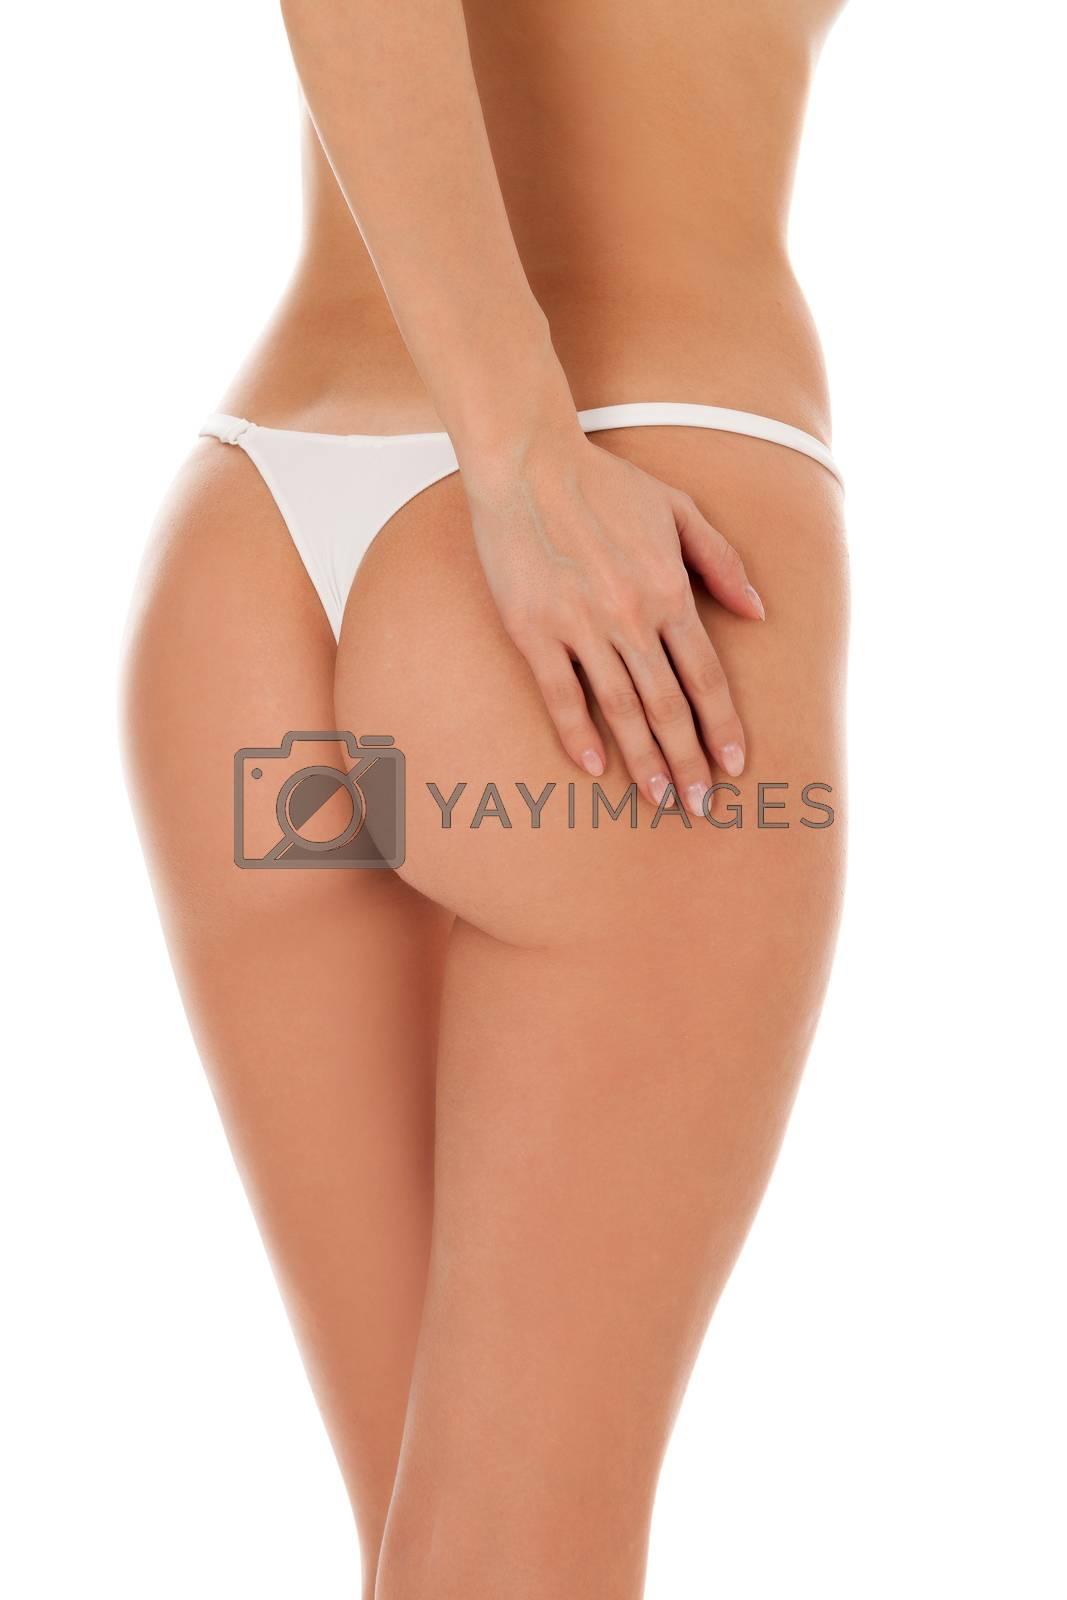 Closeup shot of beautiful female buttocks, isolated on white background